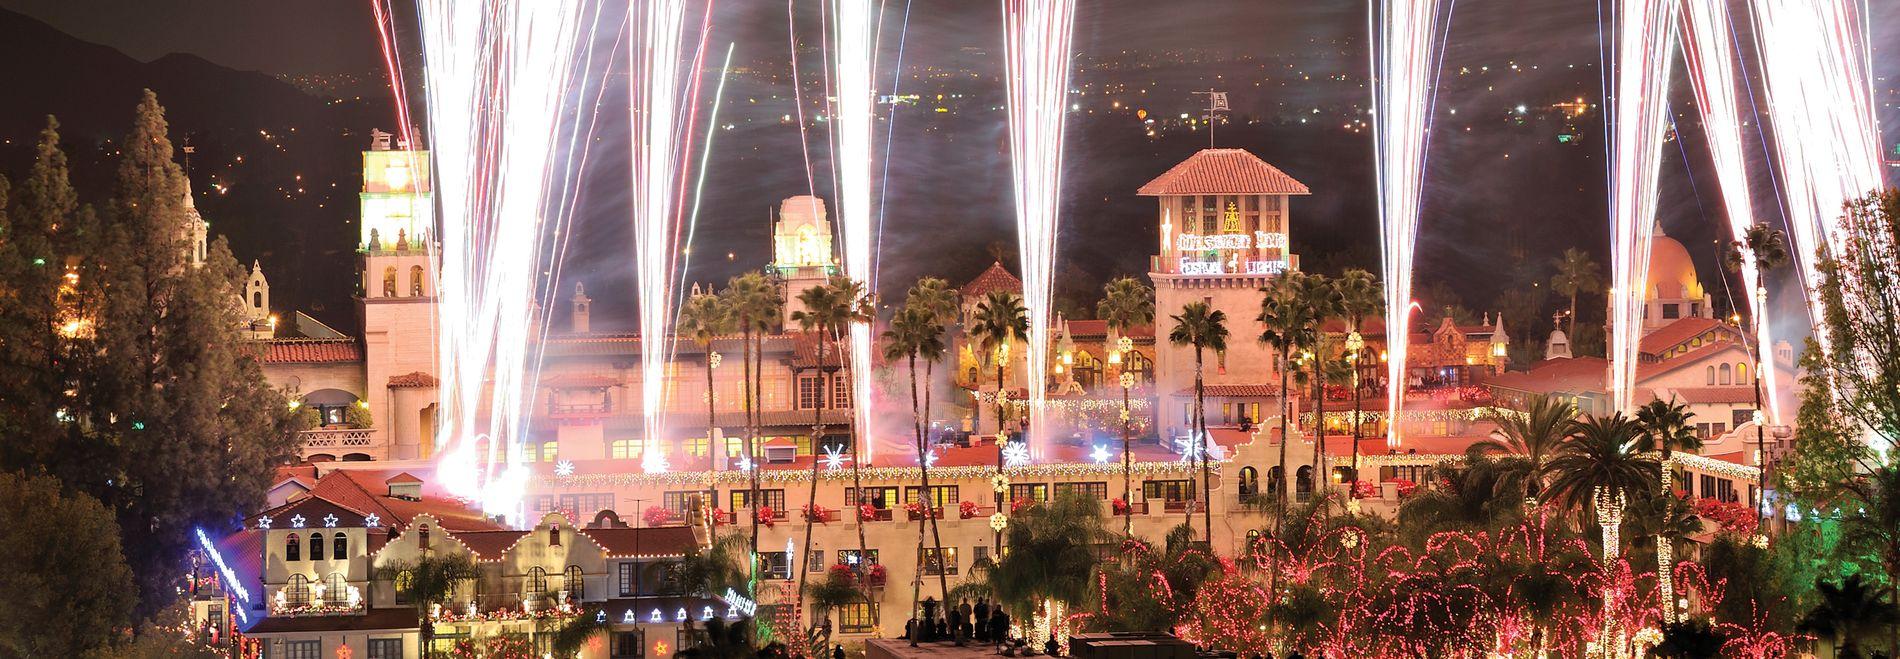 Festival of Lights at Mission Inn